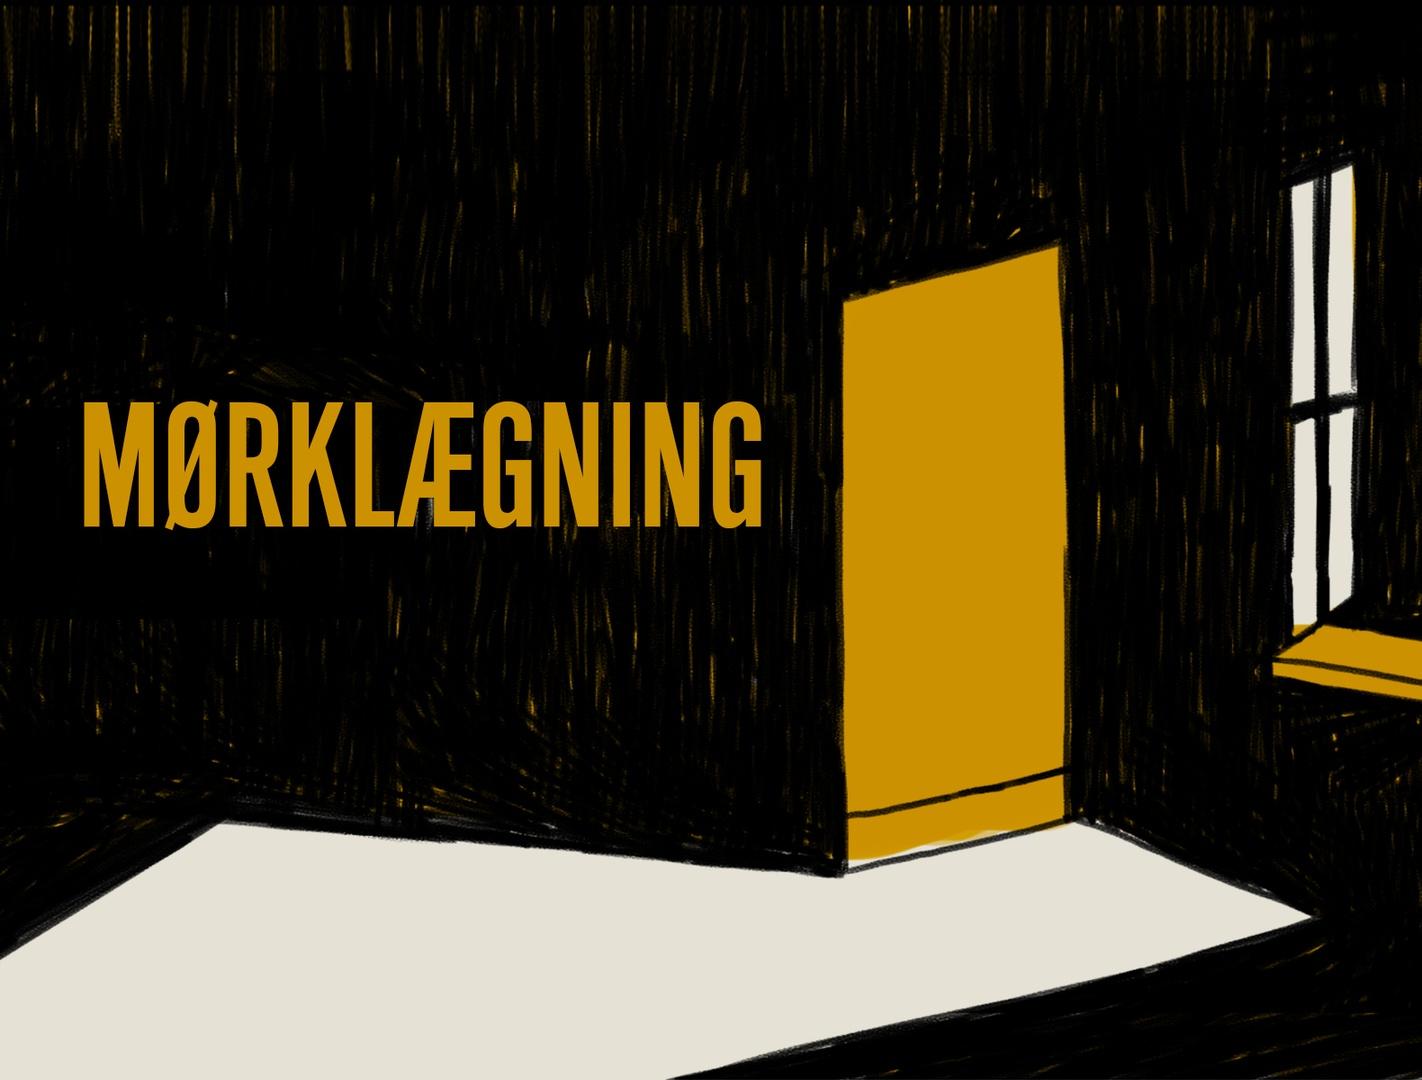 MØRKLÆGNING: Bo Lidegaard X Jes Stein Pedersen